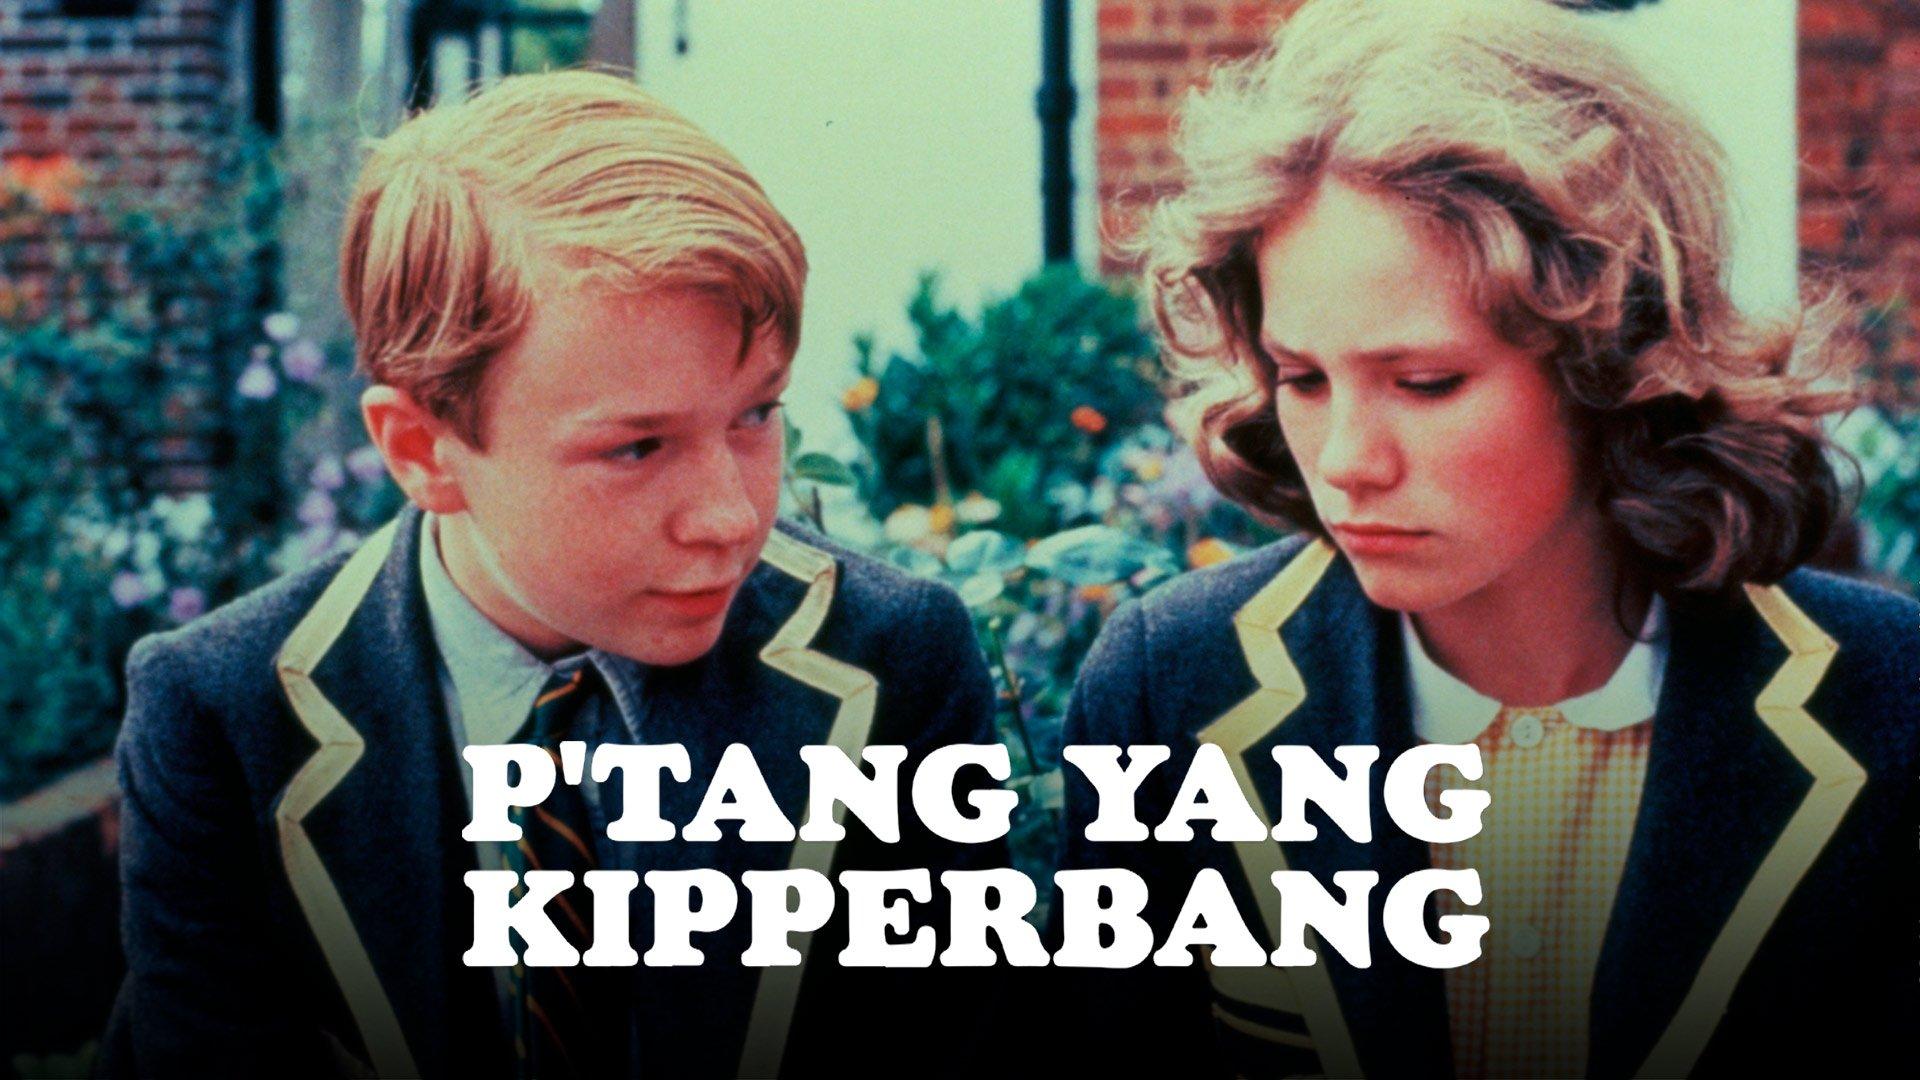 P'tang Yang Kipperbang on BritBox UK